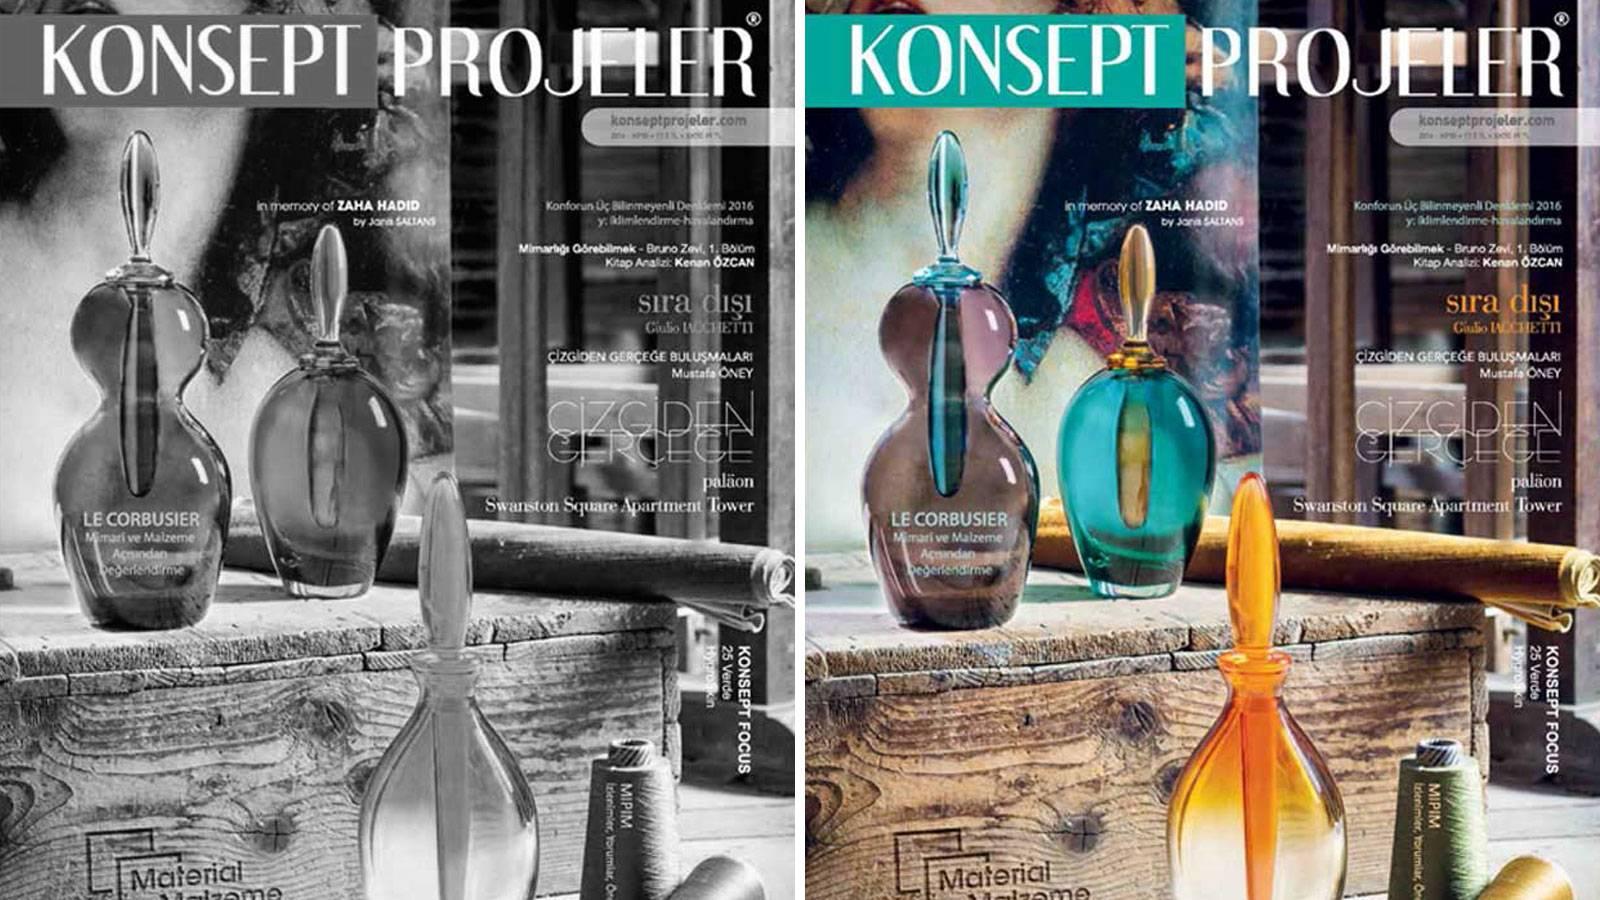 01.06.2016 50th edition of Konsept Projeler publication